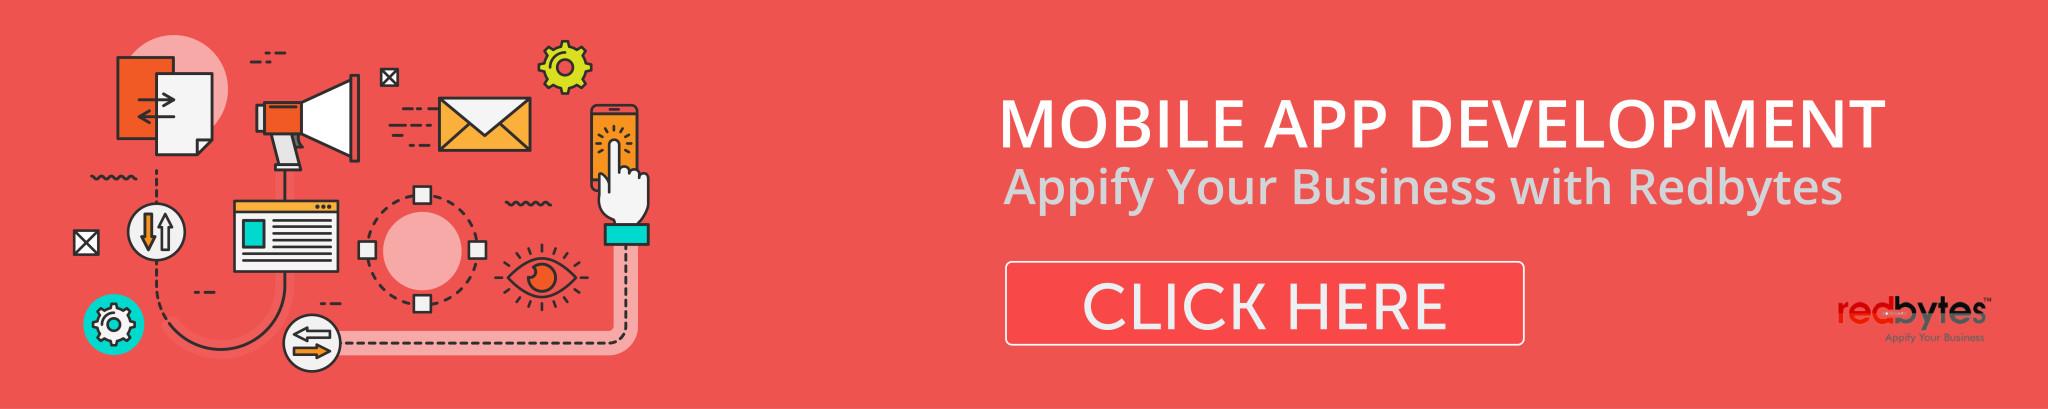 Redbytes Mobile App Development Company